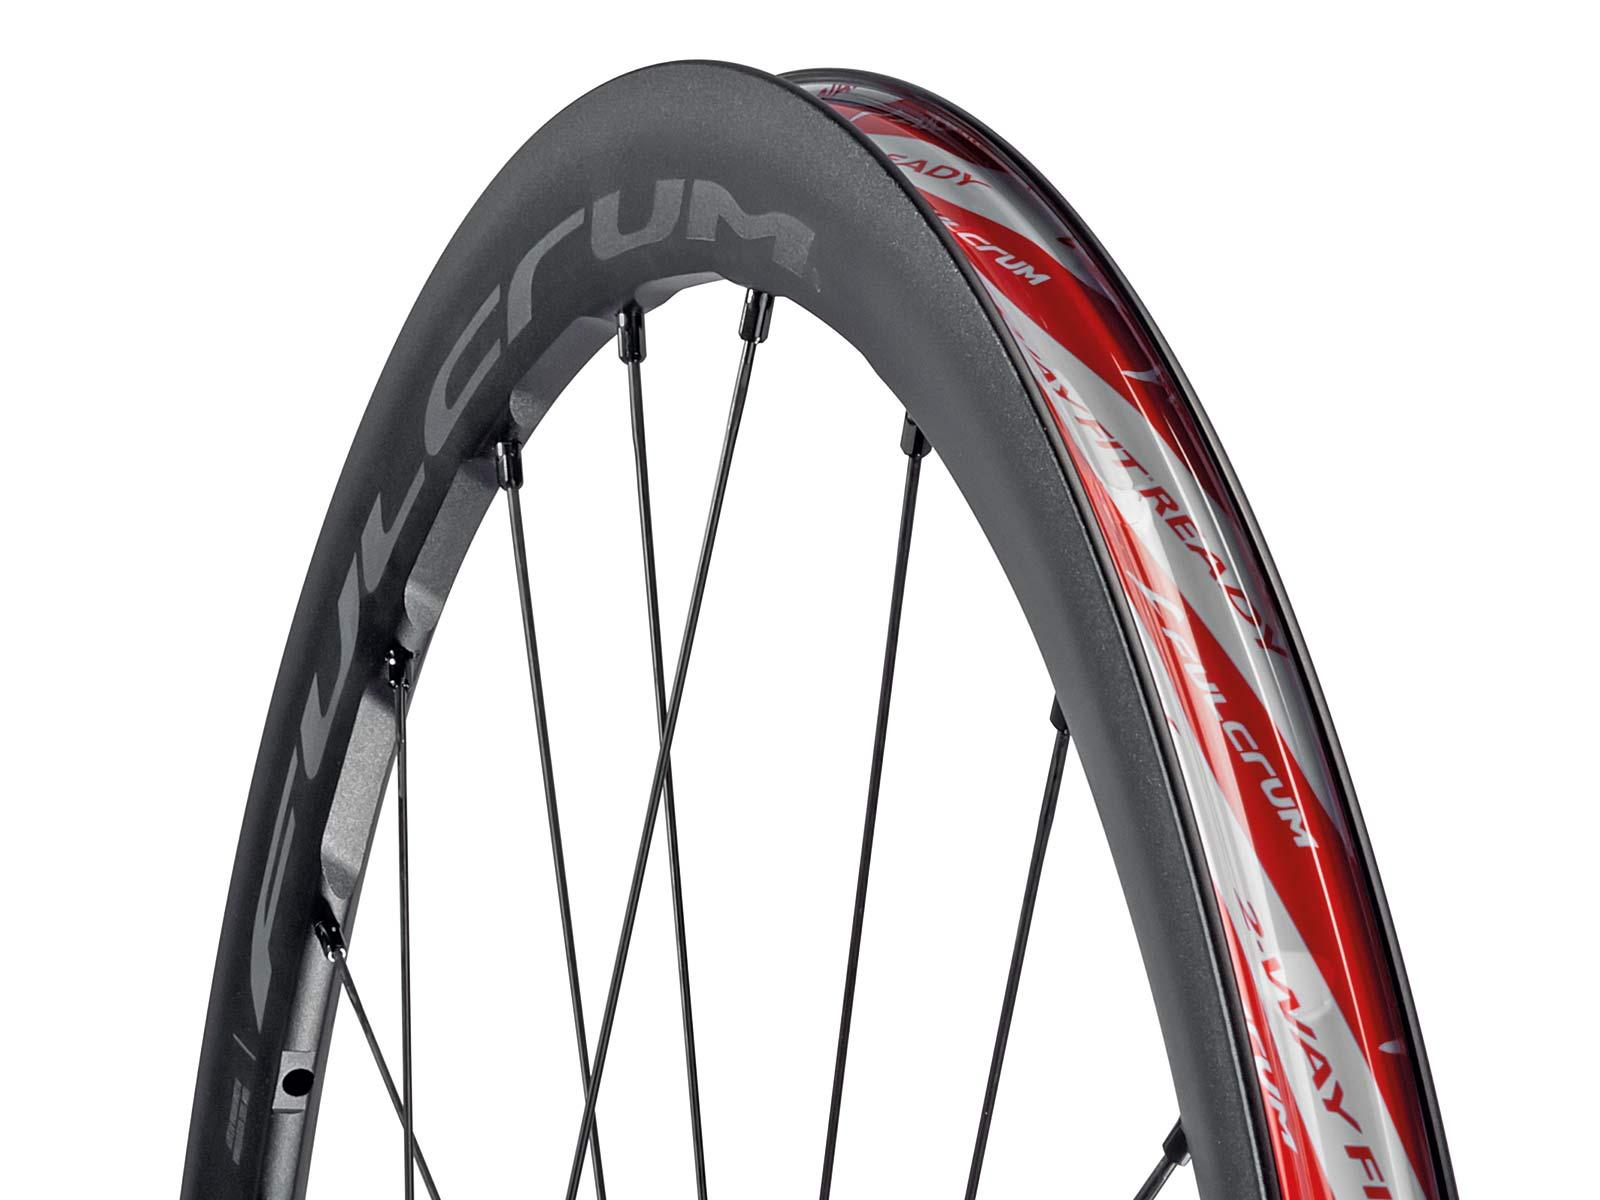 2022 Fulcrum Racing 4 DB wheels